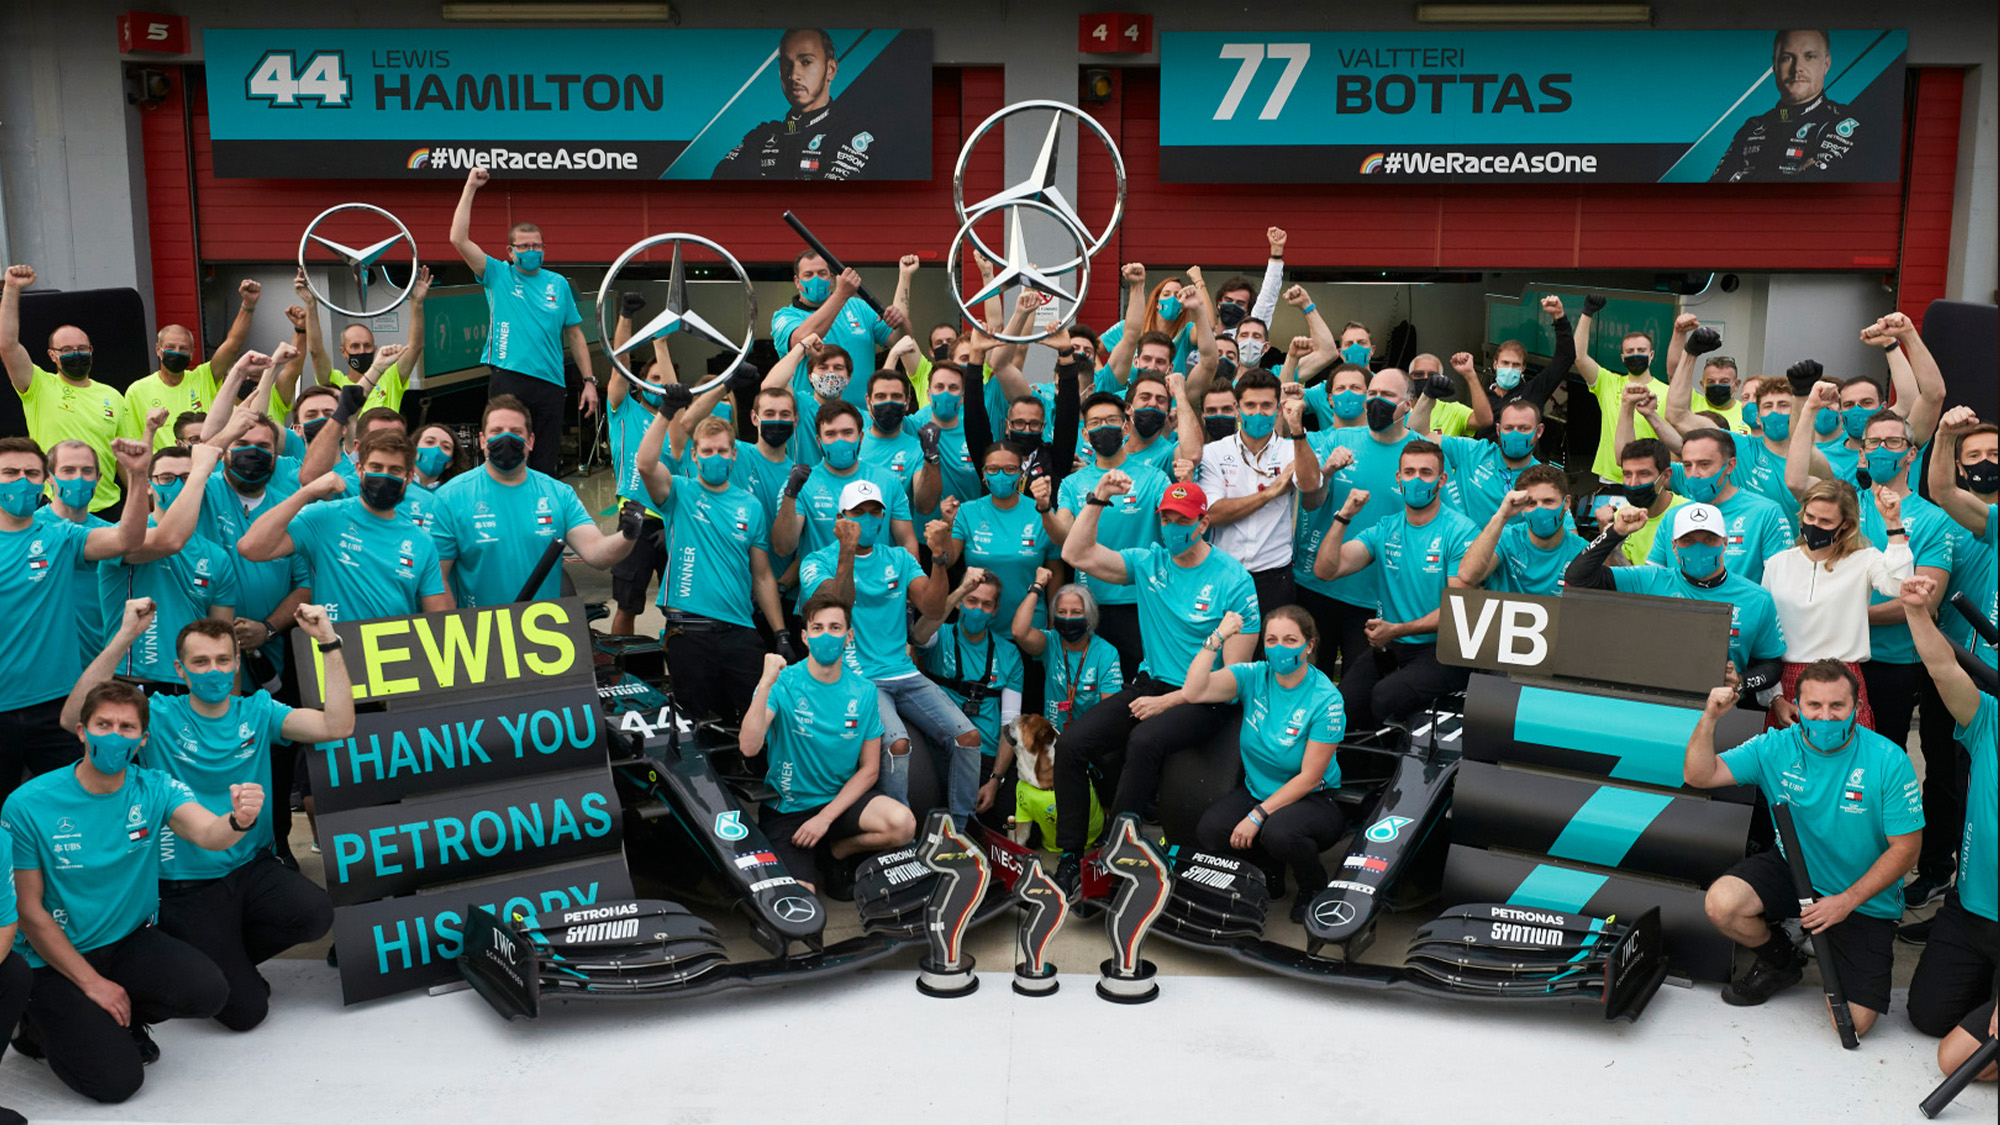 Mercedes seventh F1 constructors champioship celebration at Imola after the 2020 Emilia Romagna Grand Prix